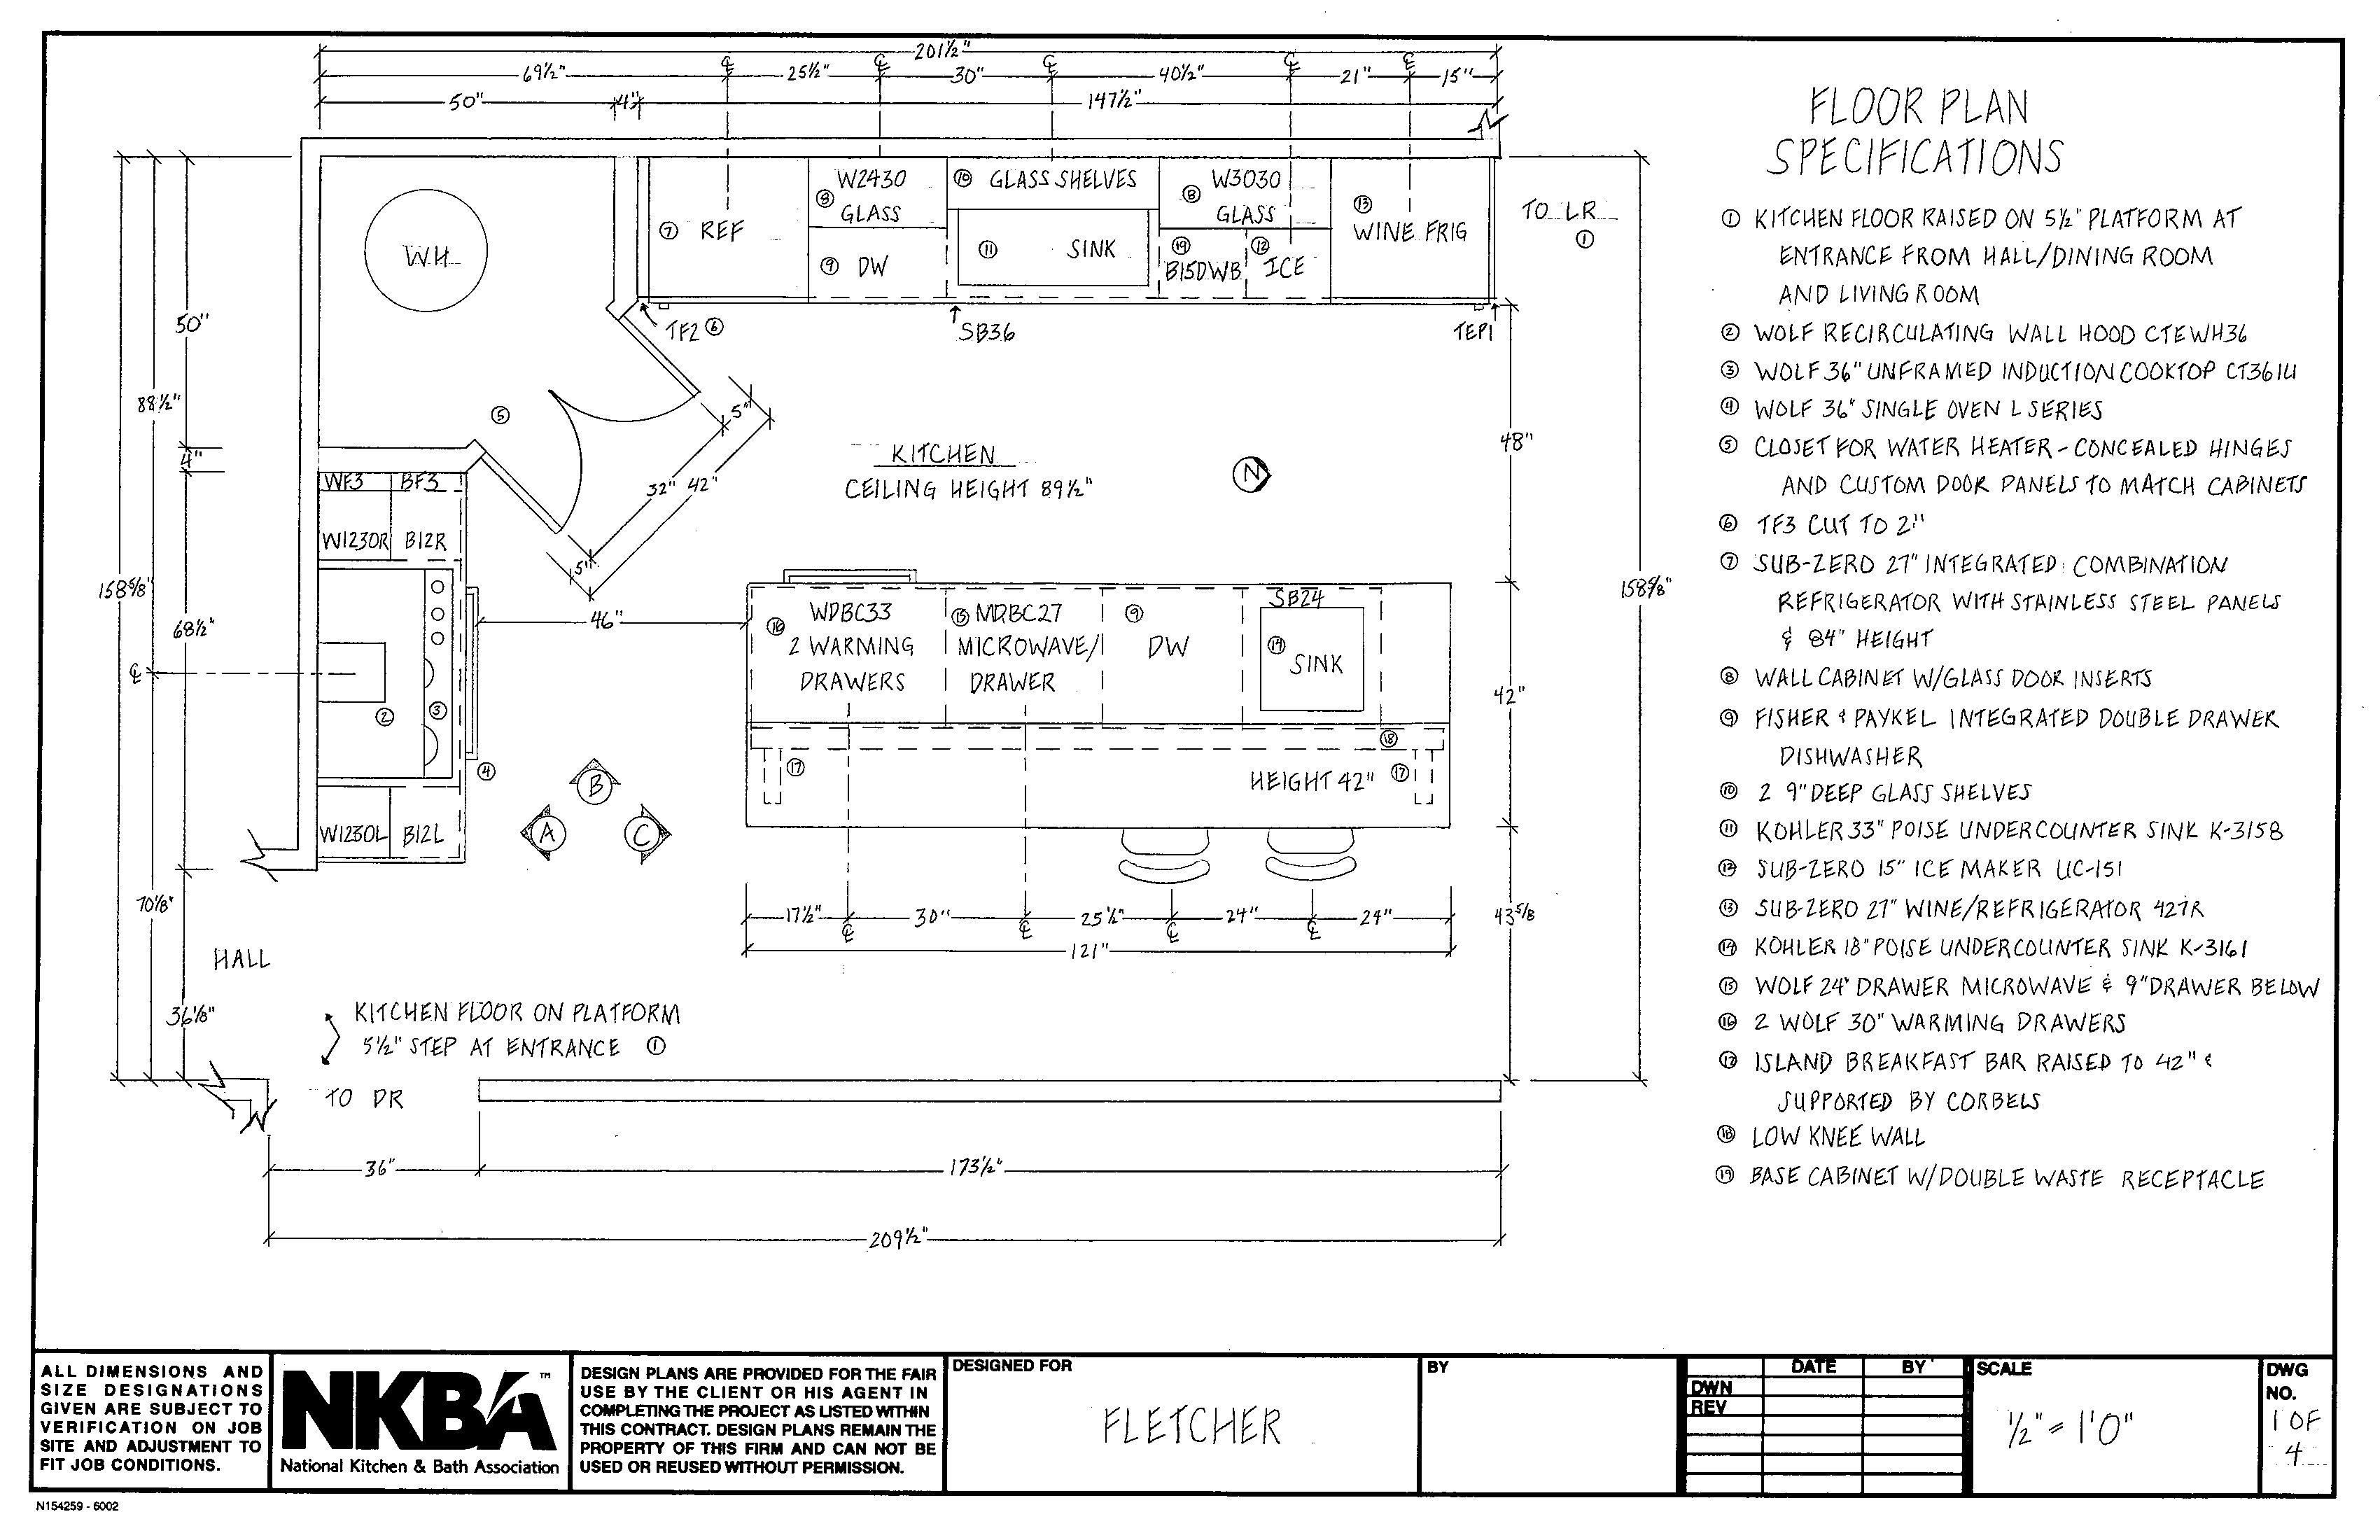 Kitchen Renovation Uncategorized Ingenious Hospital Kitchen Floor Plan 12x12 Kitchen Floor P Kitchen Layout Plans Kitchen Floor Plans House Renovation Projects